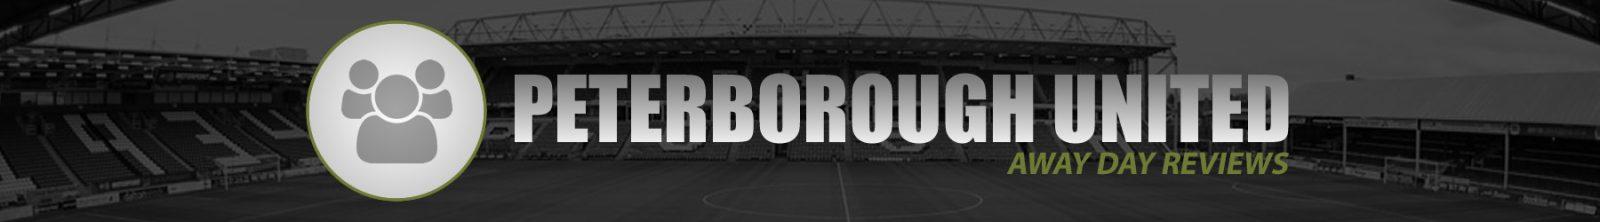 Review Peterborough United